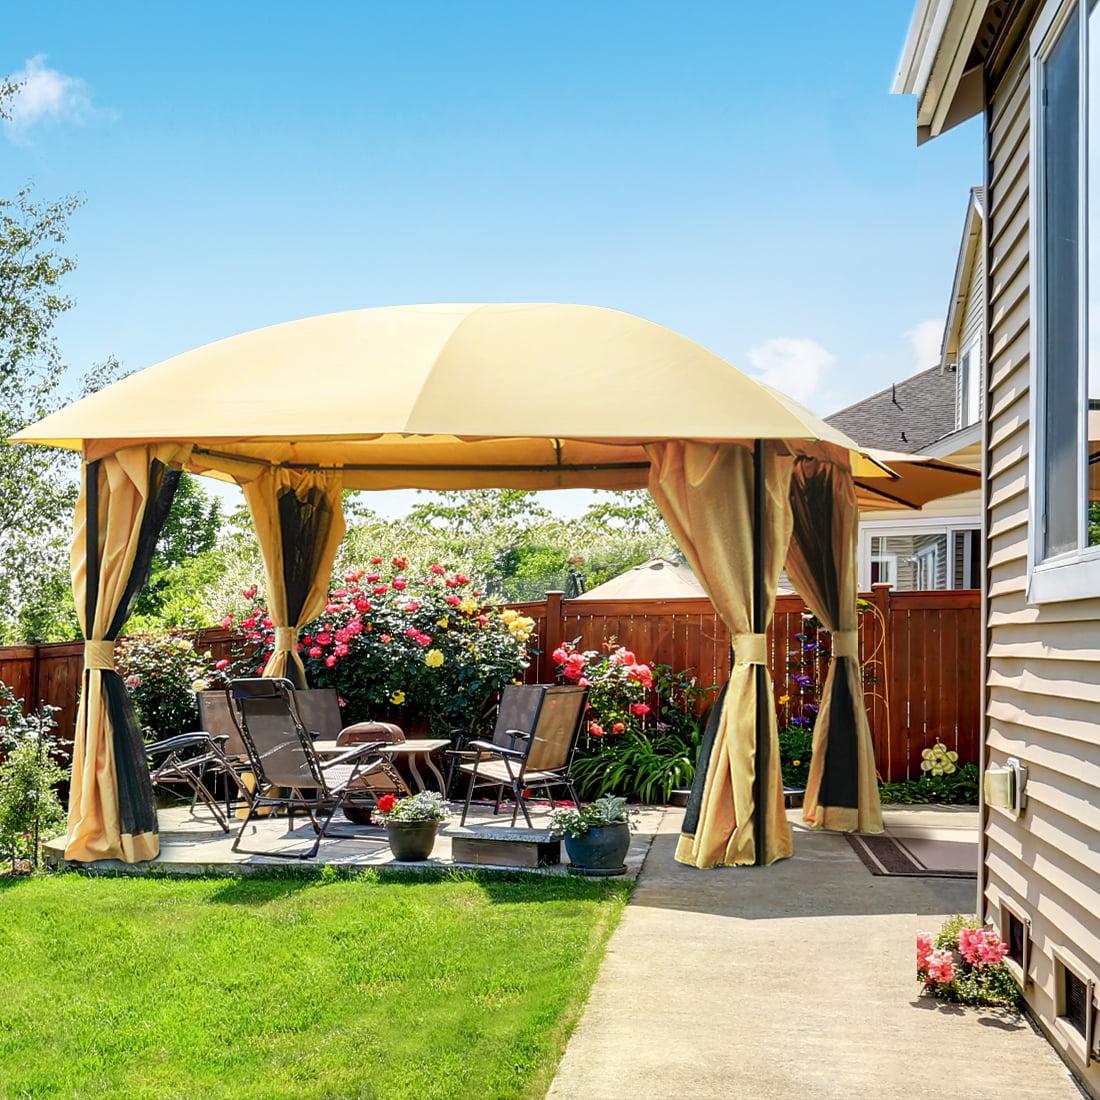 Quictent 12x12 Metal Gazebo With Mosquito Netting Sides Screened Gazebo Canopy Pergola For Deck Patio And Backyard Waterproof Tan Tan Walmart Com Walmart Com